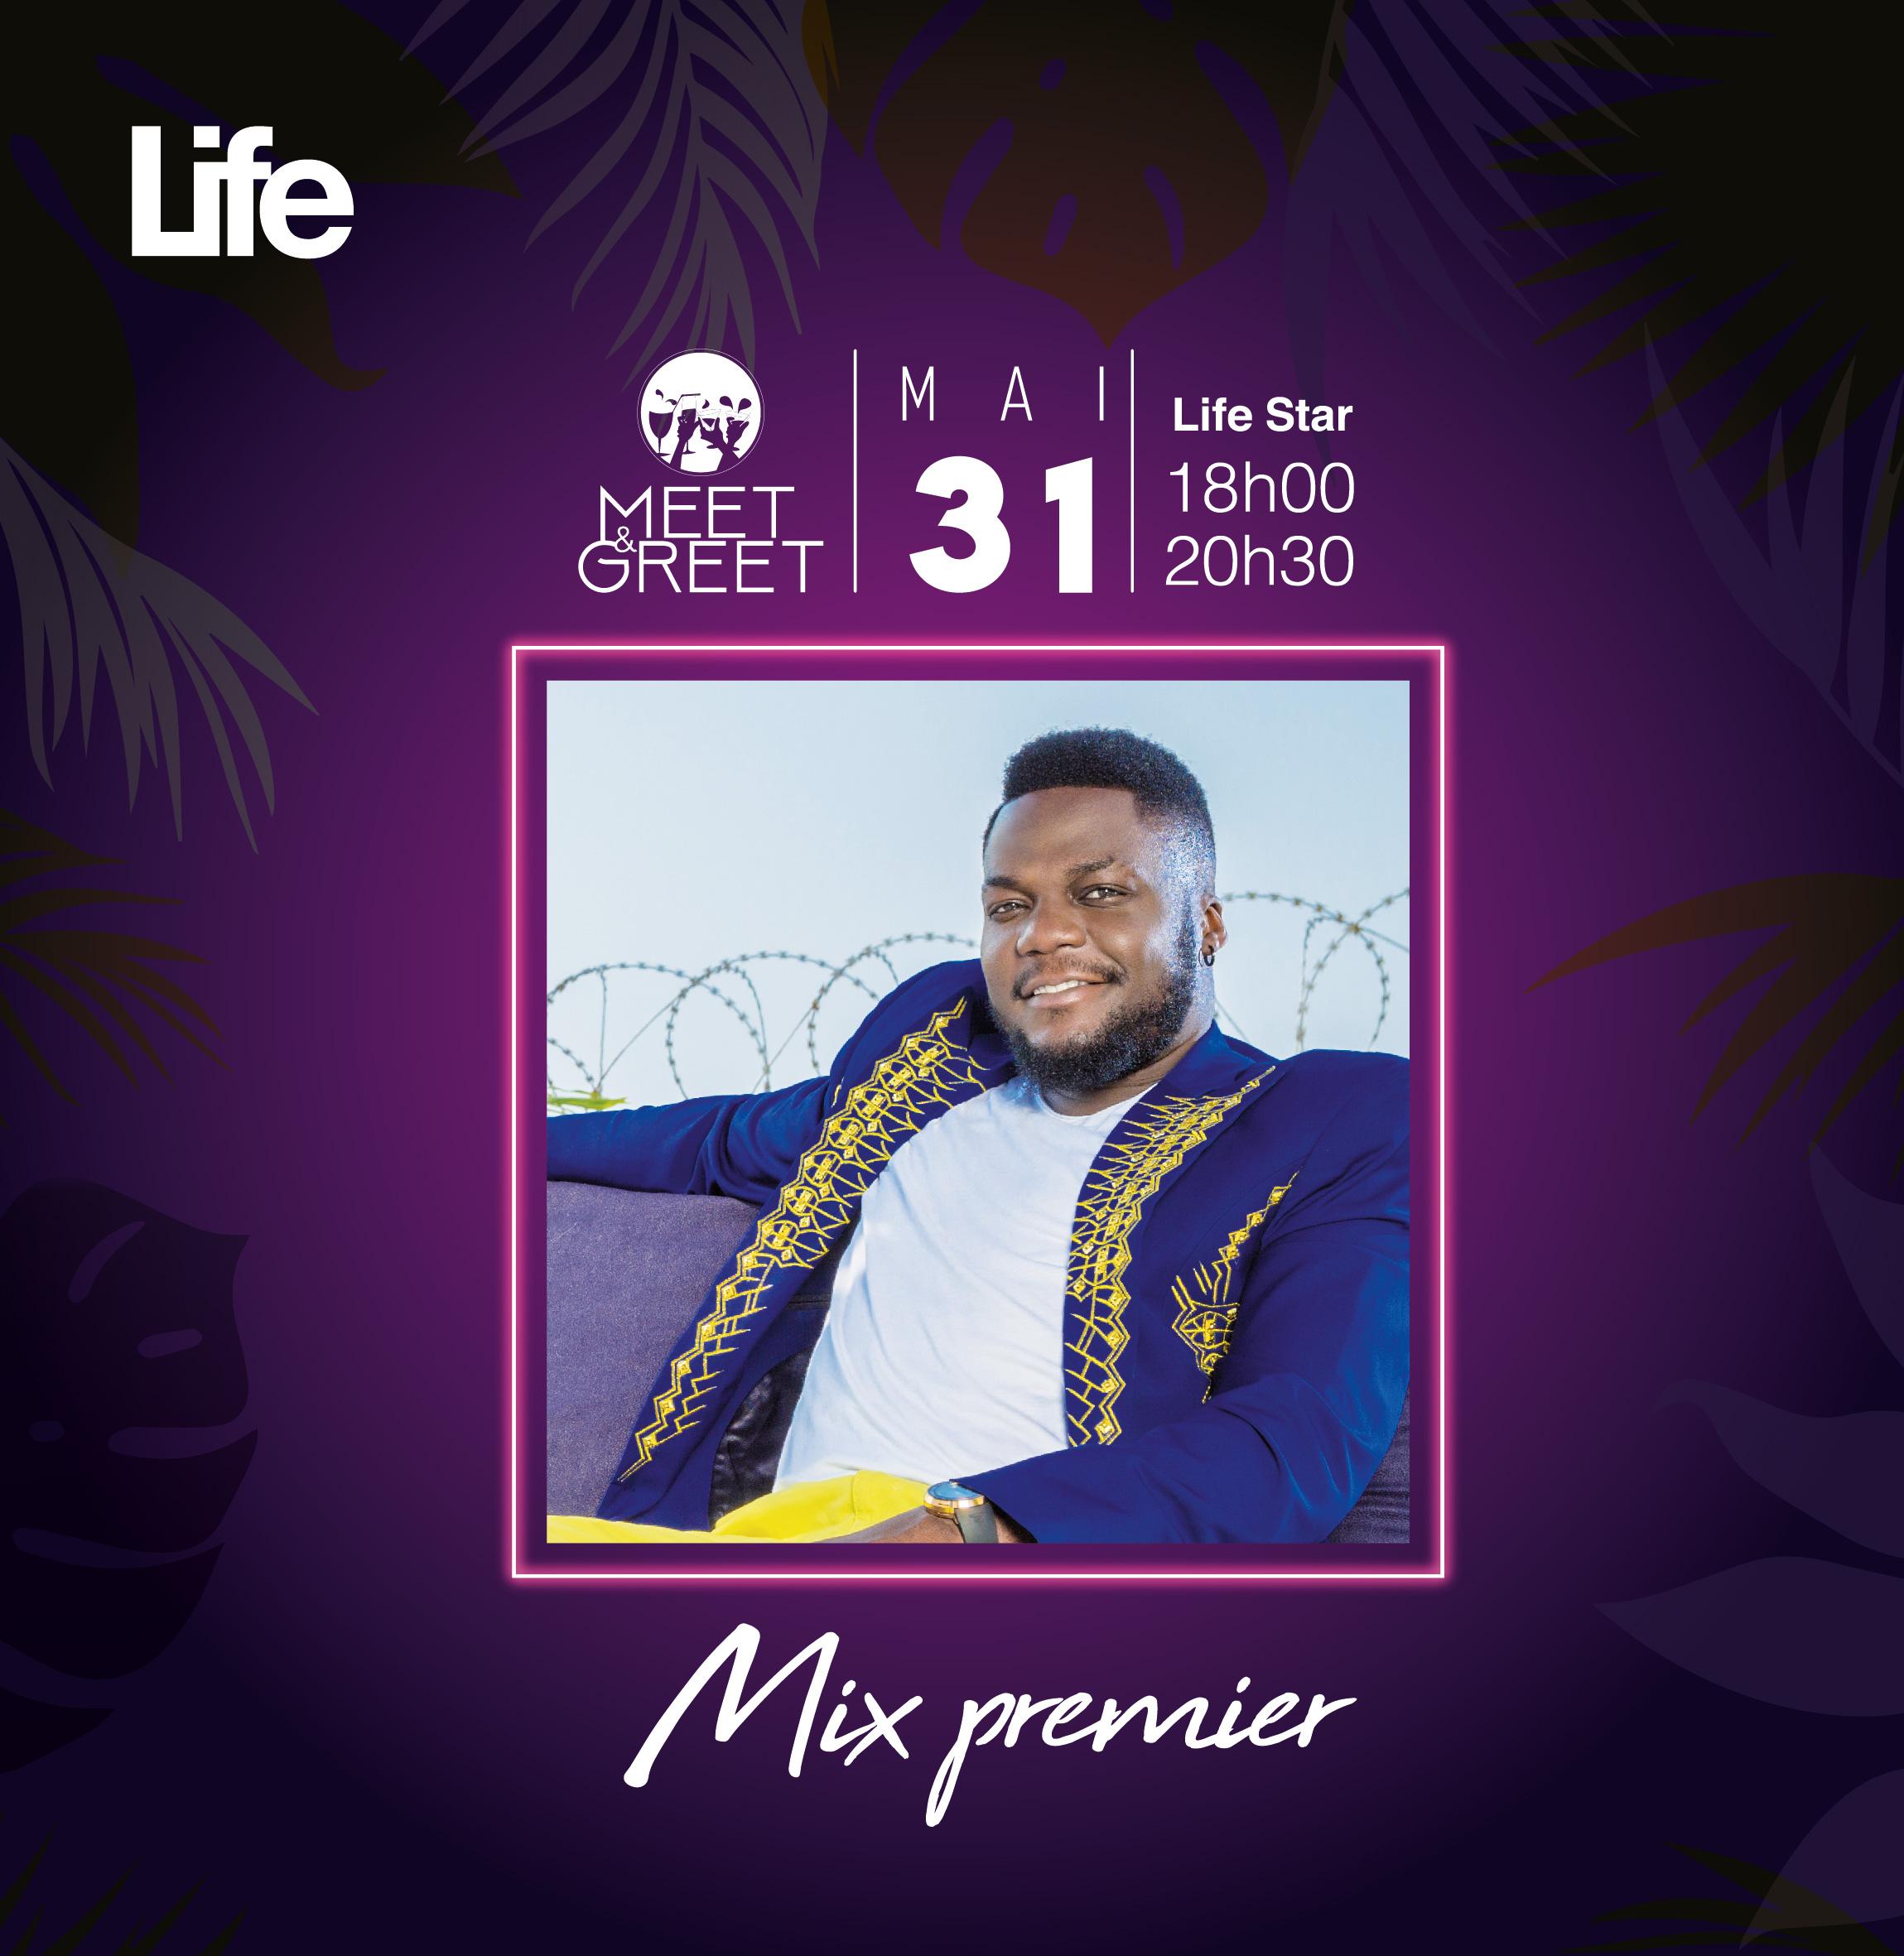 Life #138 meet & greet propo1-02